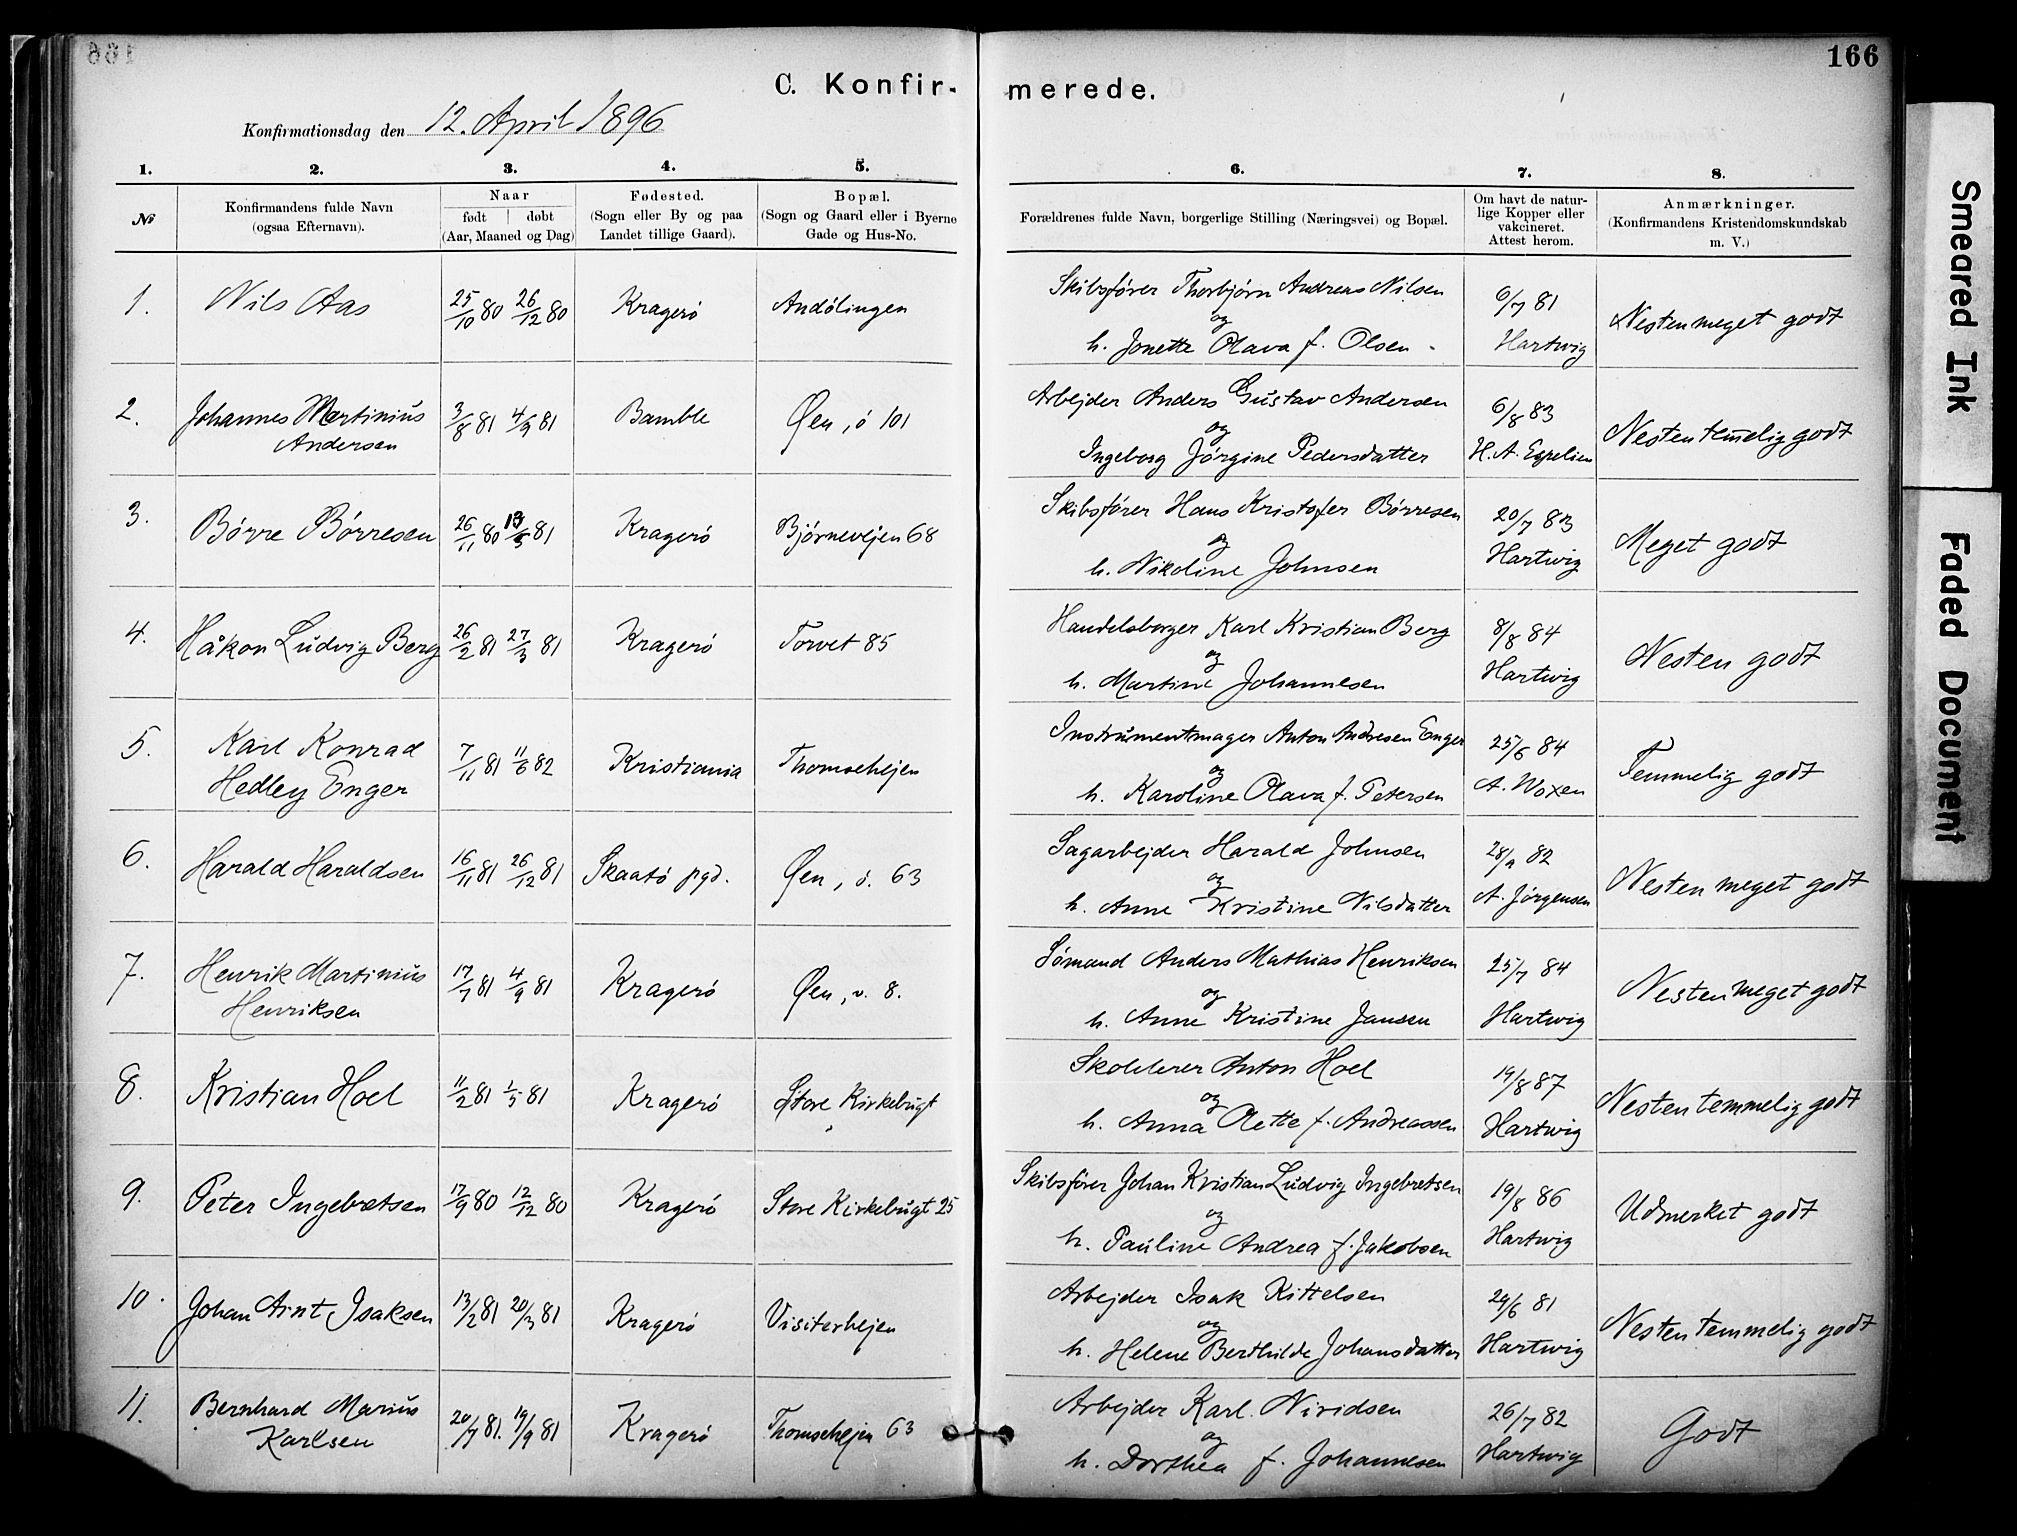 SAKO, Kragerø kirkebøker, F/Fa/L0012: Ministerialbok nr. I 12, 1880-1904, s. 166